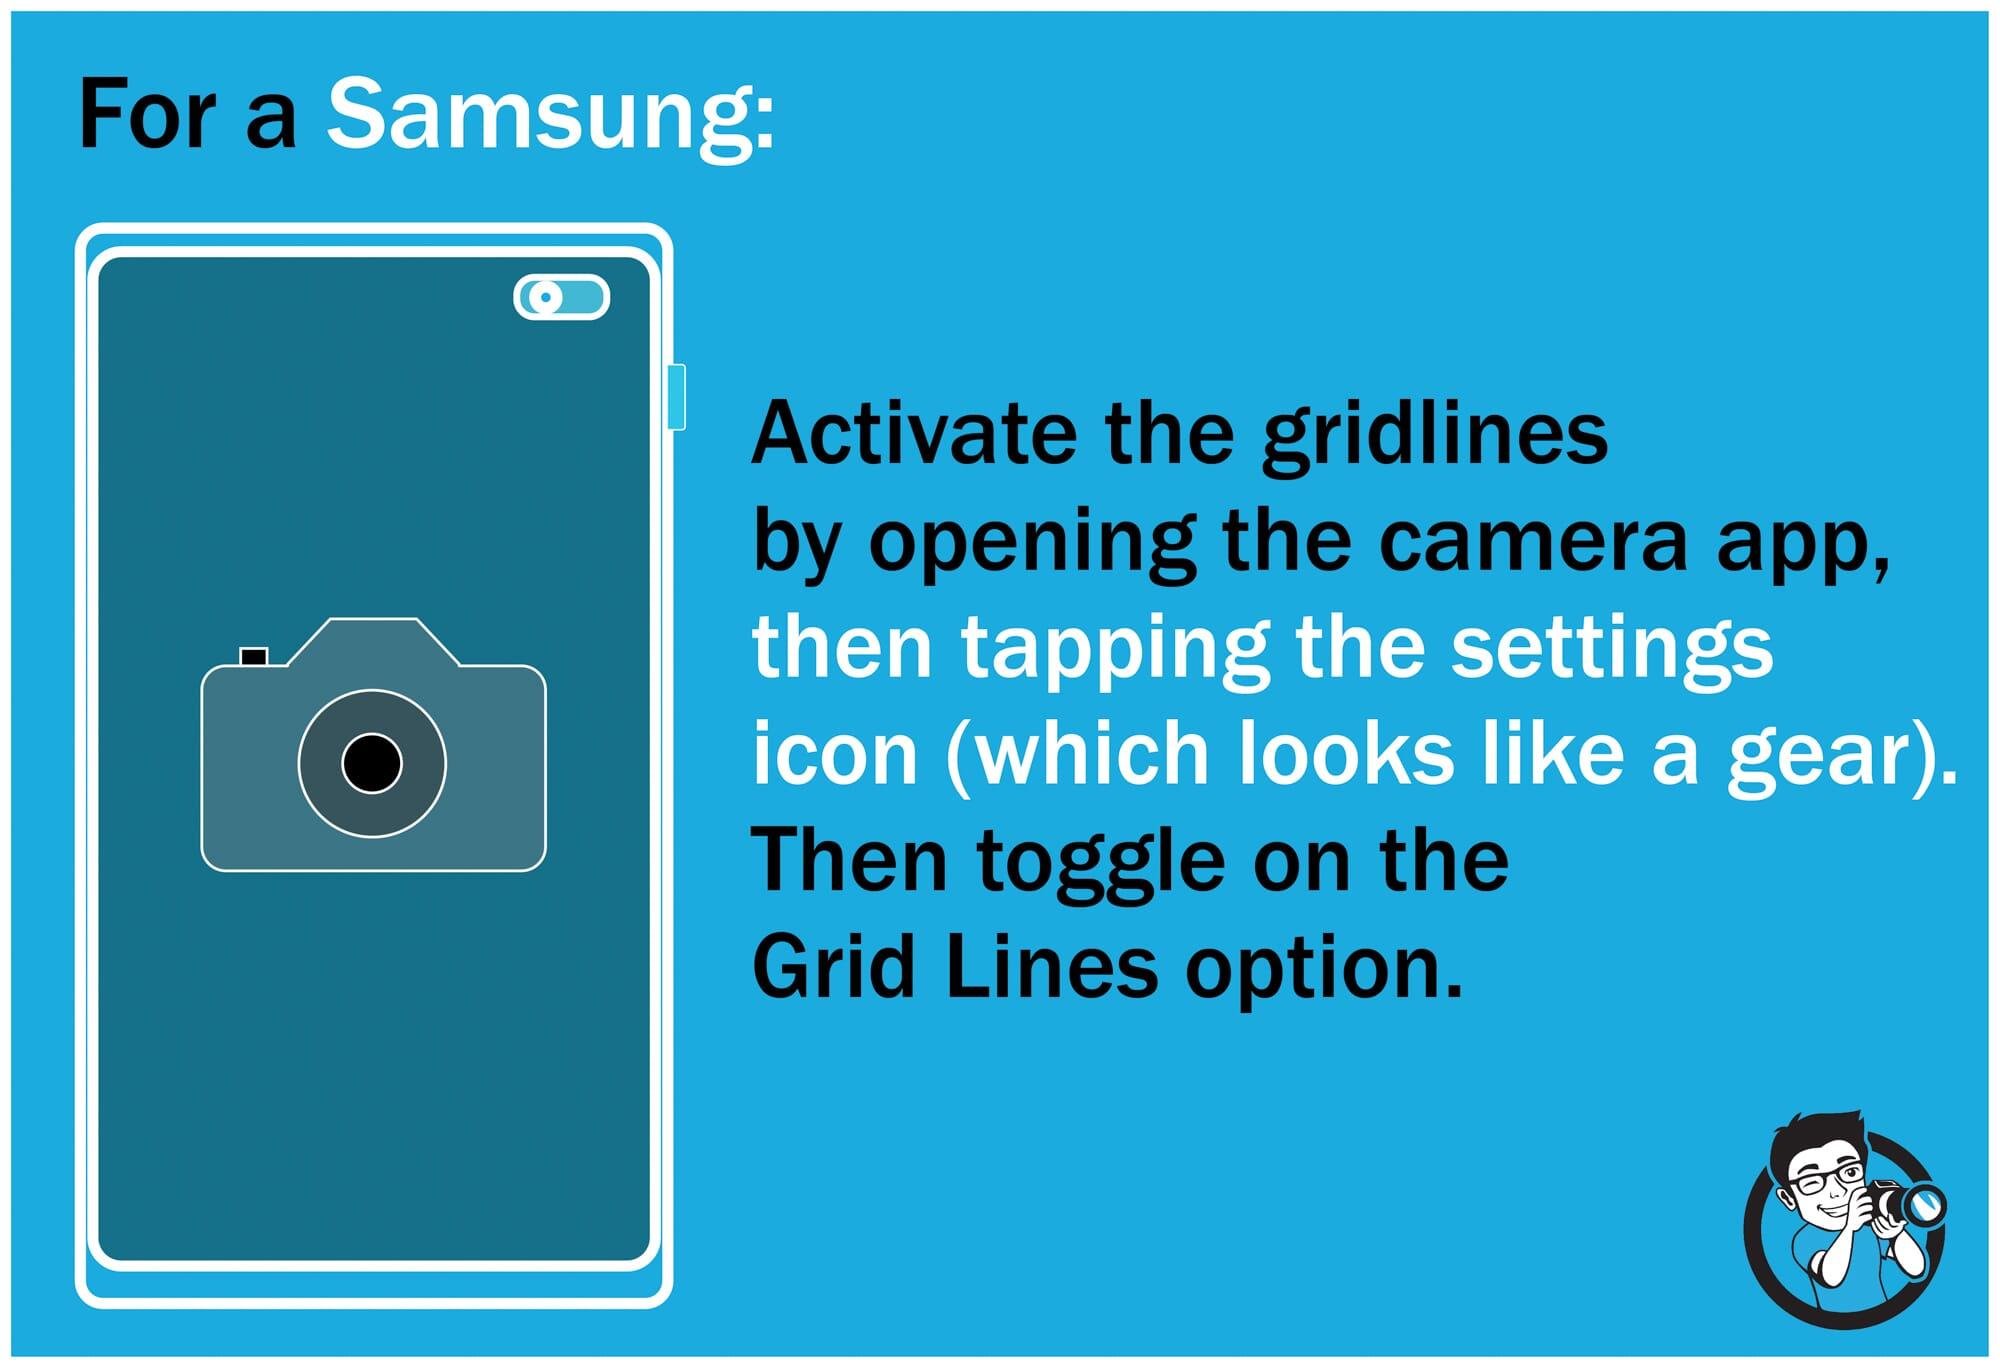 Activate grid samsung smartphone